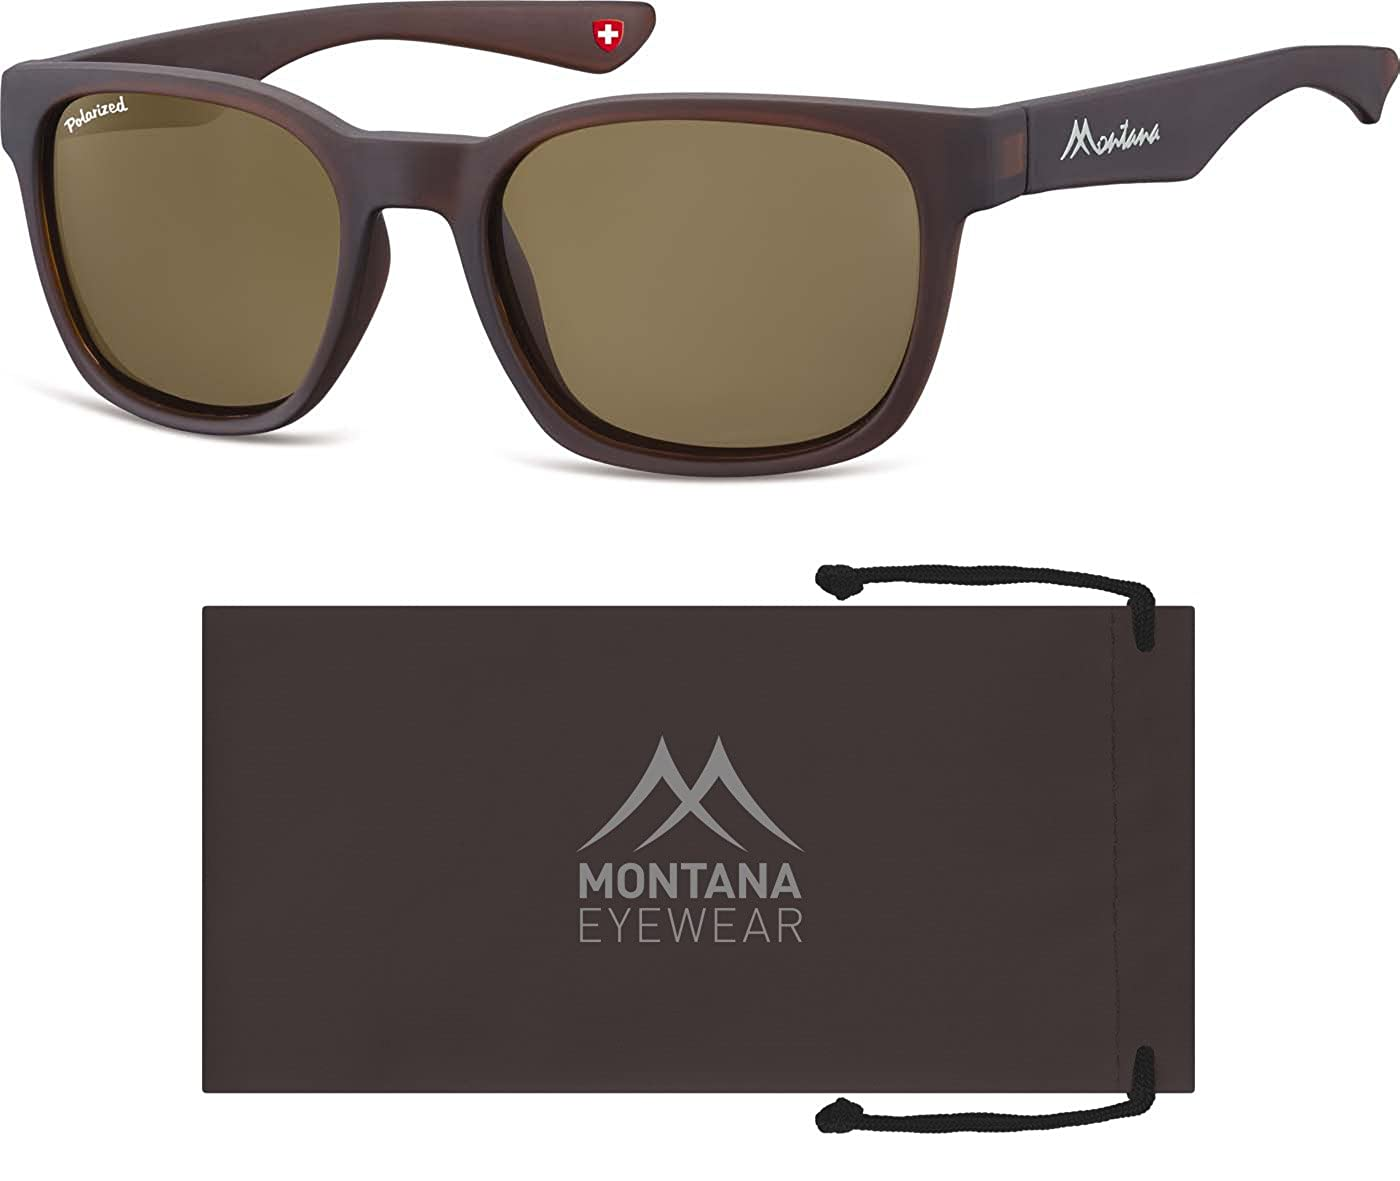 Montana Eyewear Sunoptic MP30B Sonnenbrille in braun, inklusive Stoffbeutel